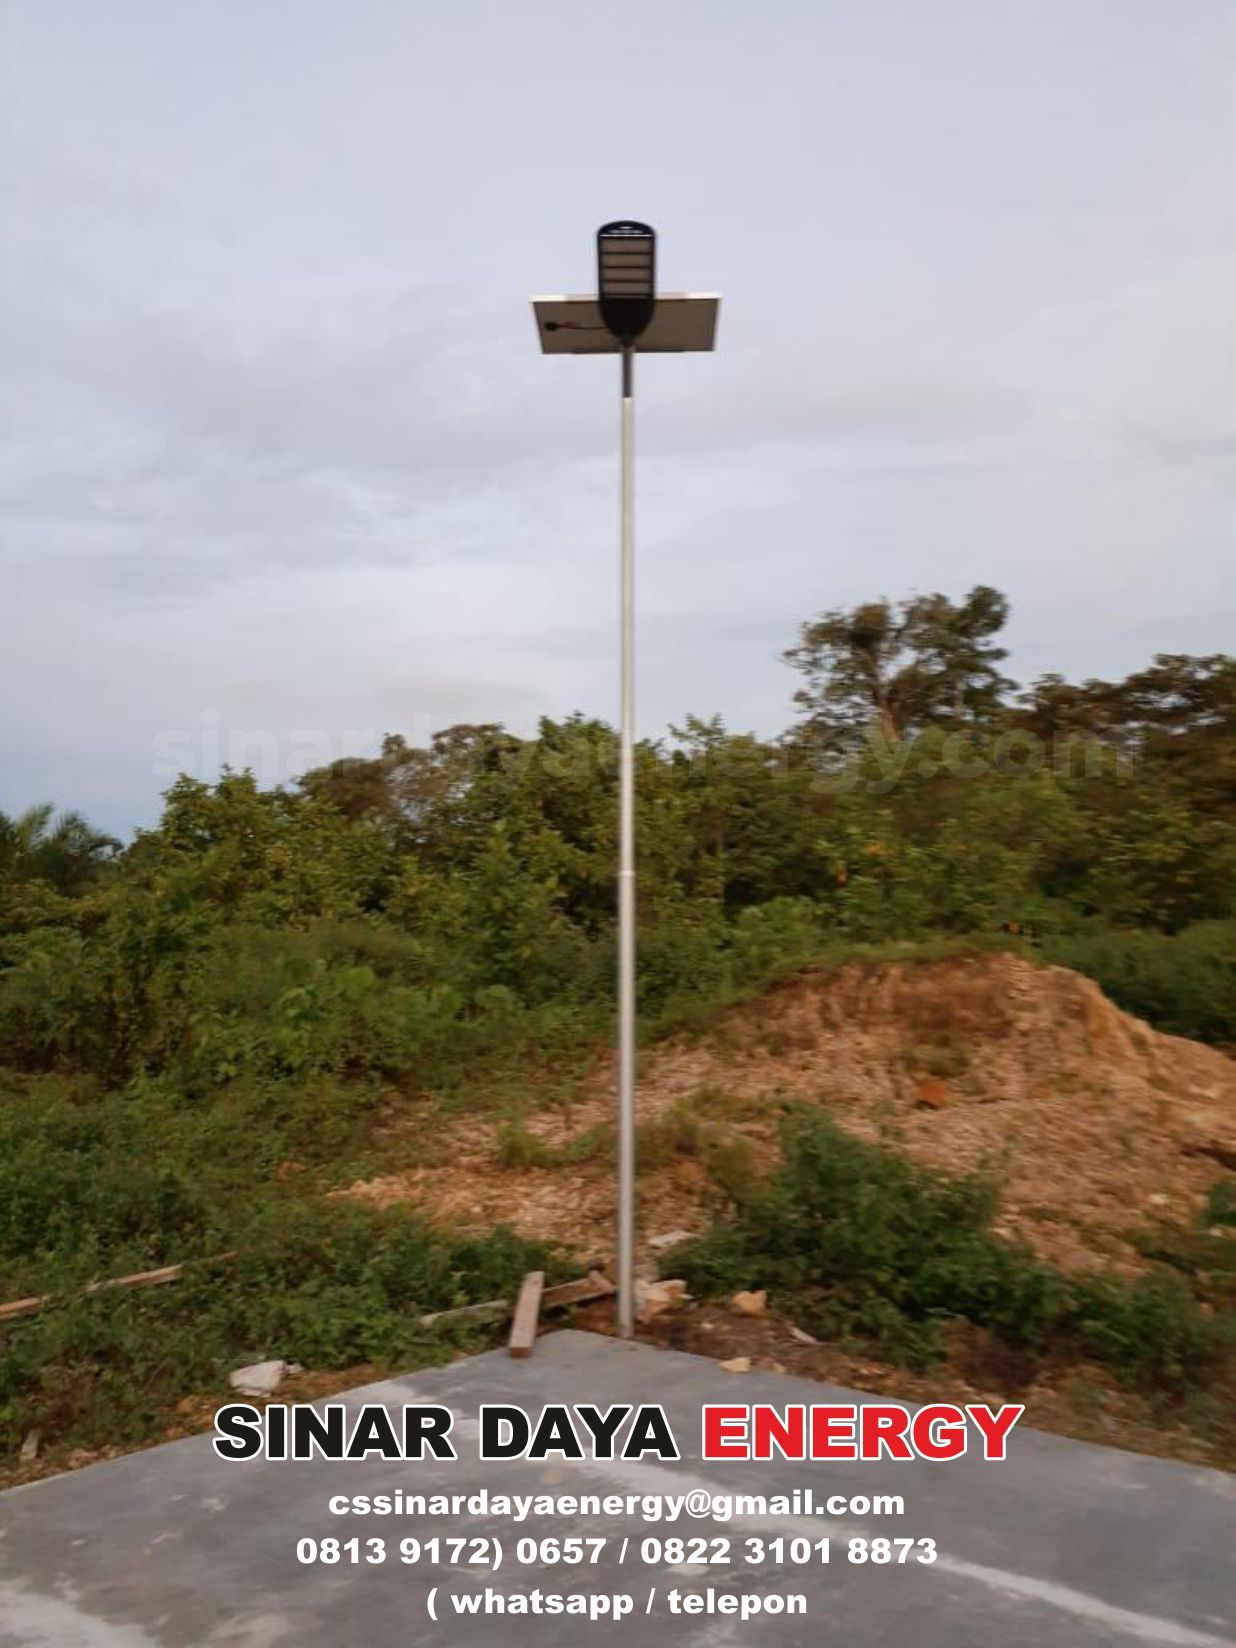 lampu jalan solarcell 2in1 papua